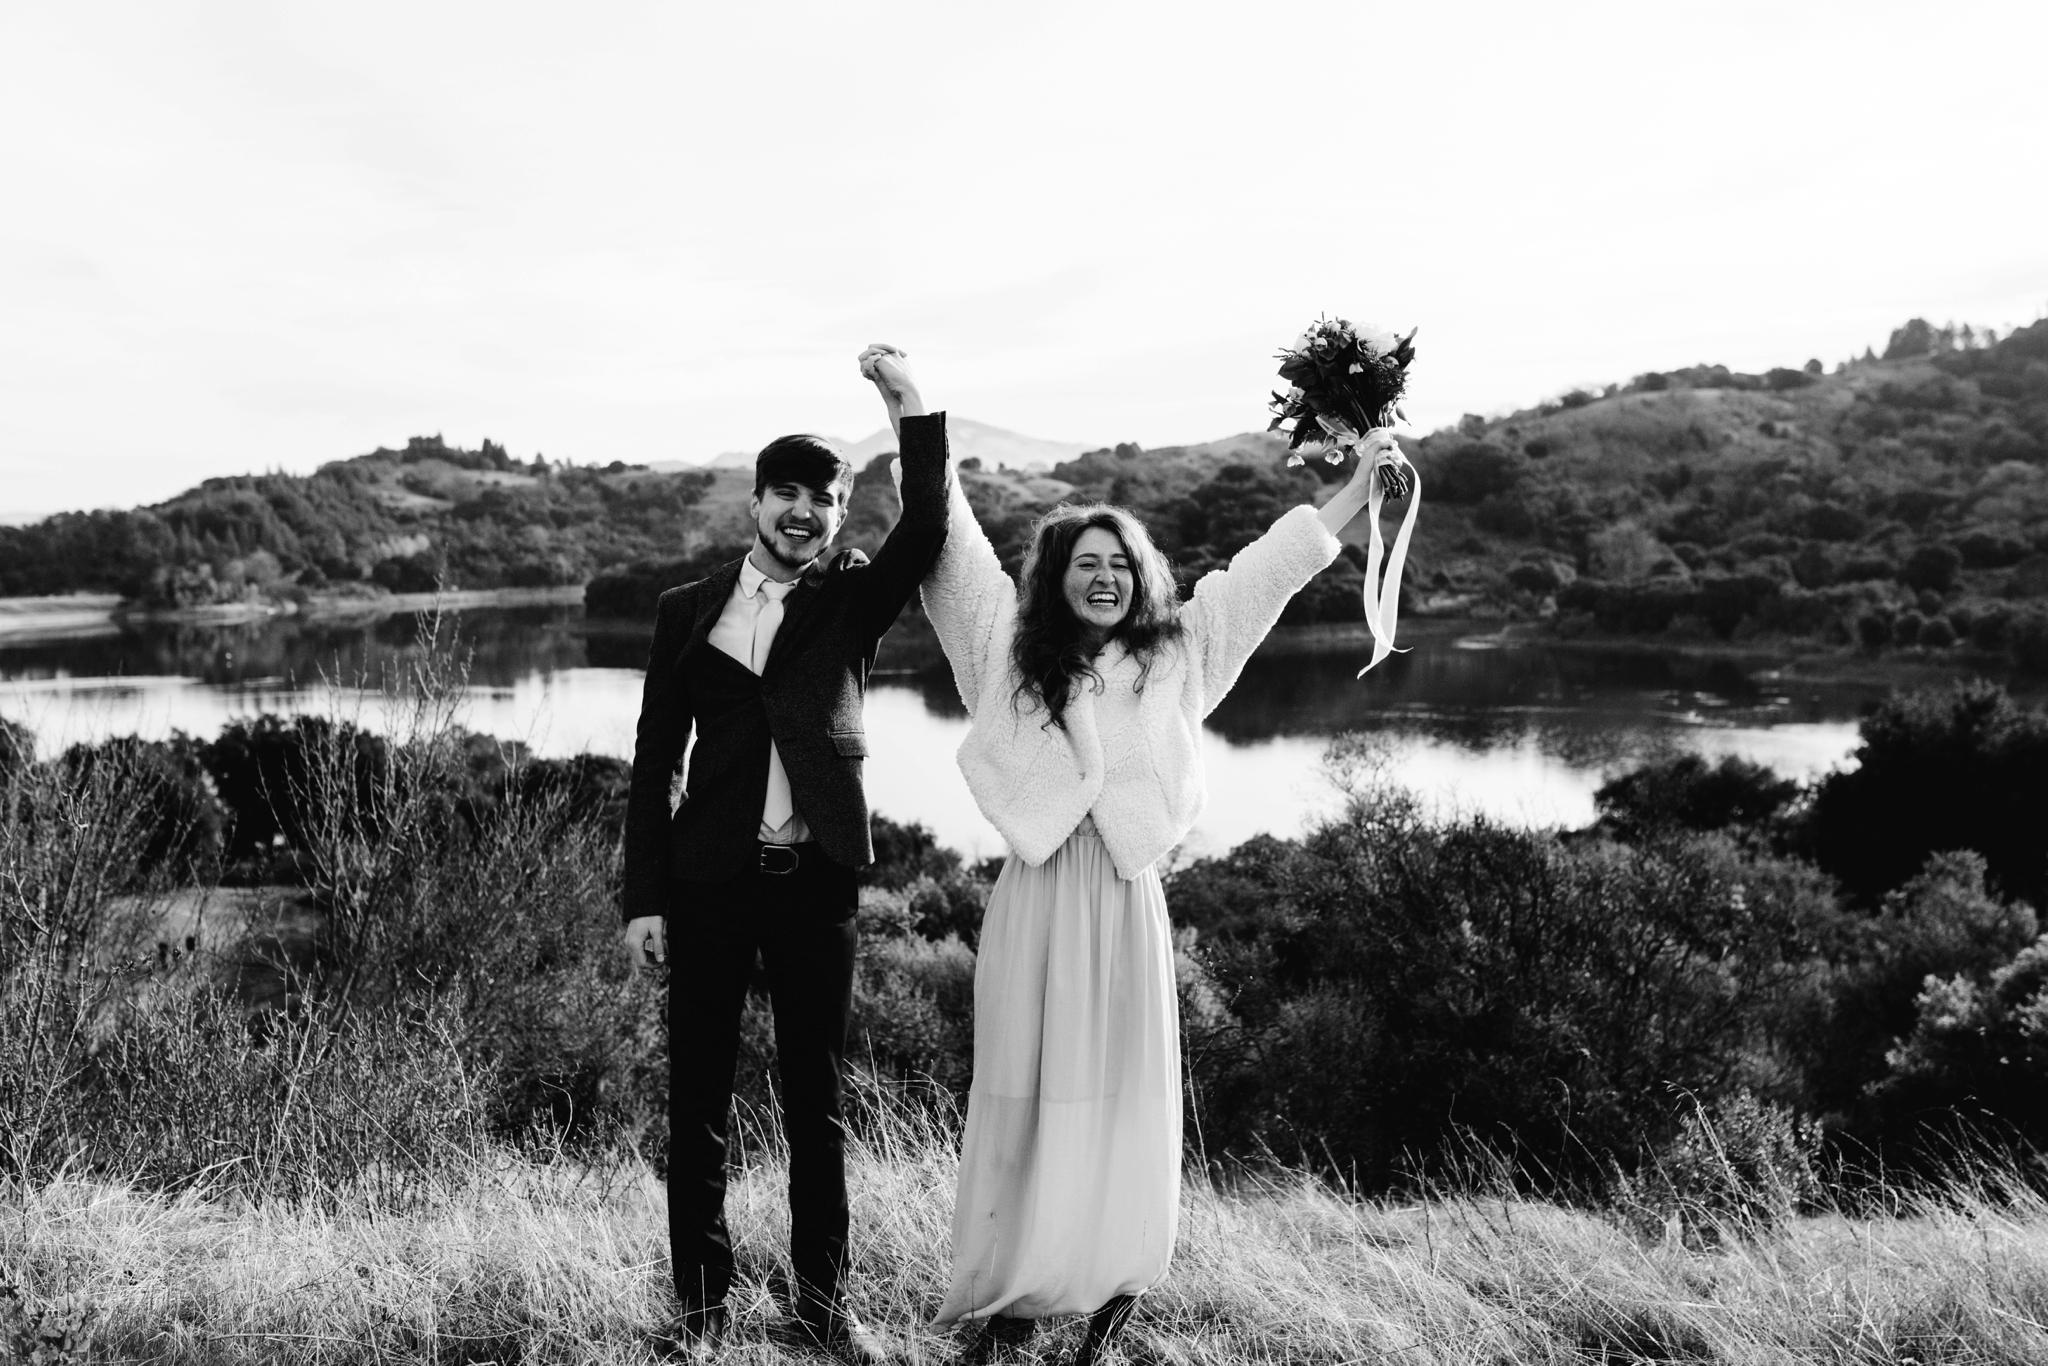 Lafayette Reservoir Elopement // Lafayette Reservoir wedding // Bay Area wedding photographer // San Francisco wedding photographer // sf Bay Area elopement photographer // destination elopement photographer // destination wedding photographer // Northern California wedding photographer